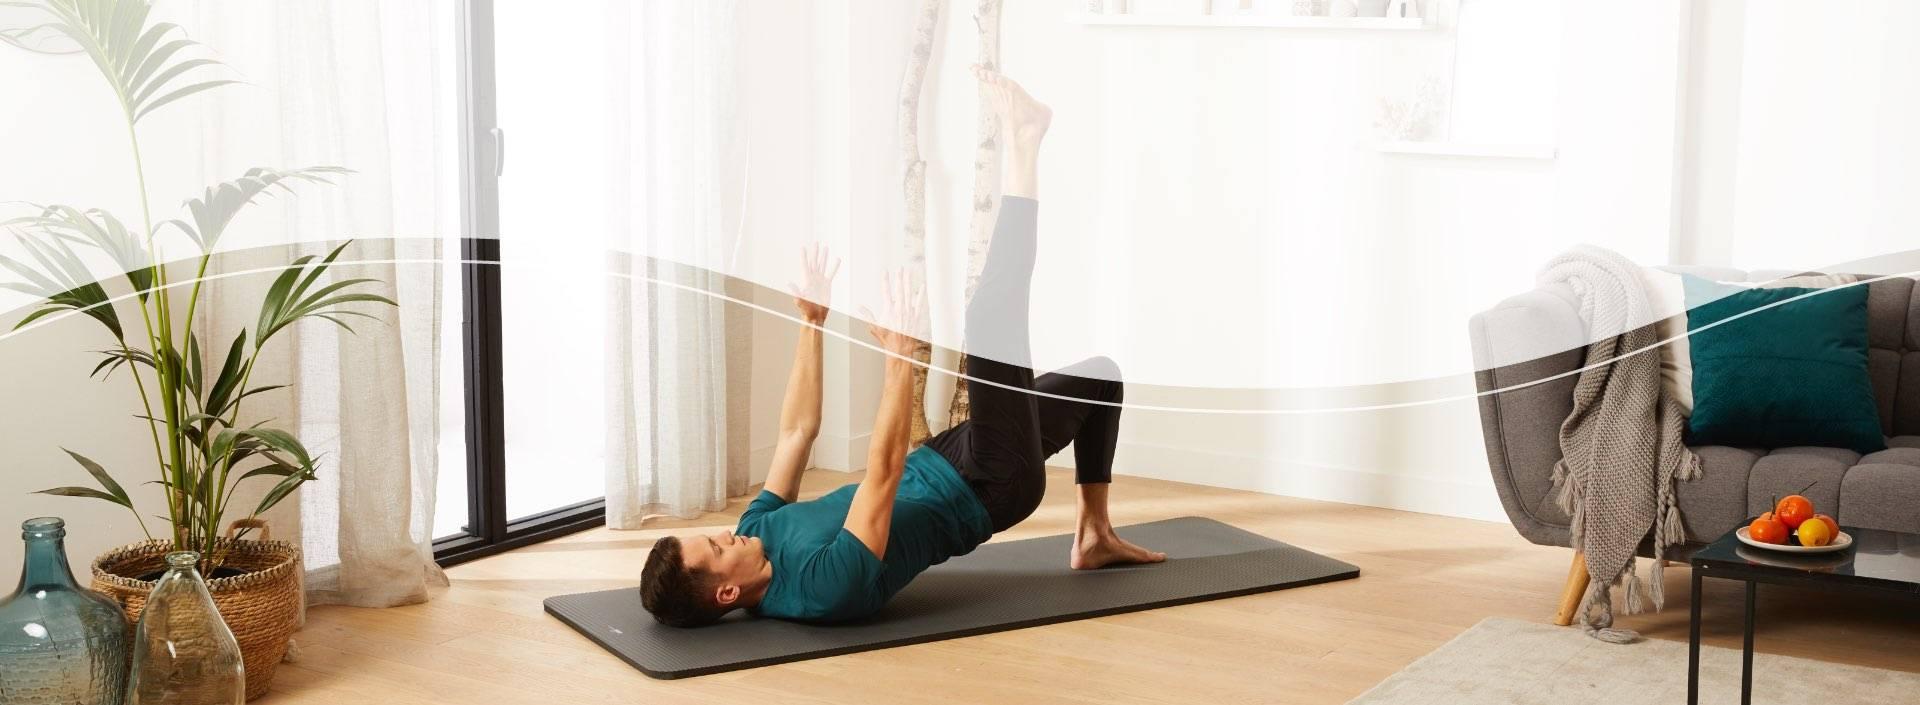 Exercise &Training エクササイズ&トレーニング